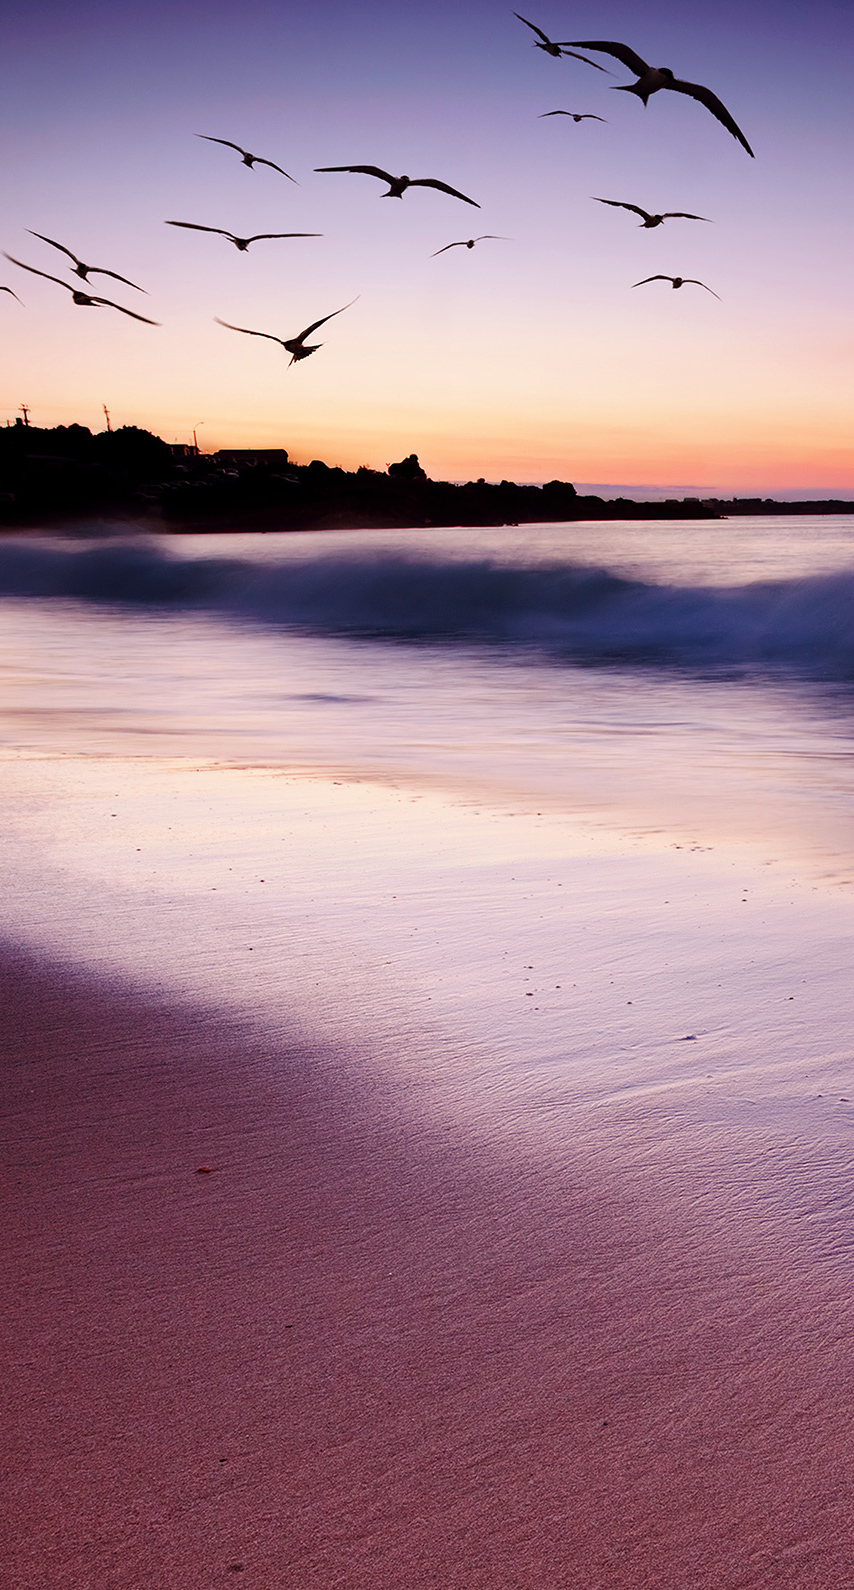 sparkle, evening, sun, dawn, dusk, cloud, reflection, seascape, seashore